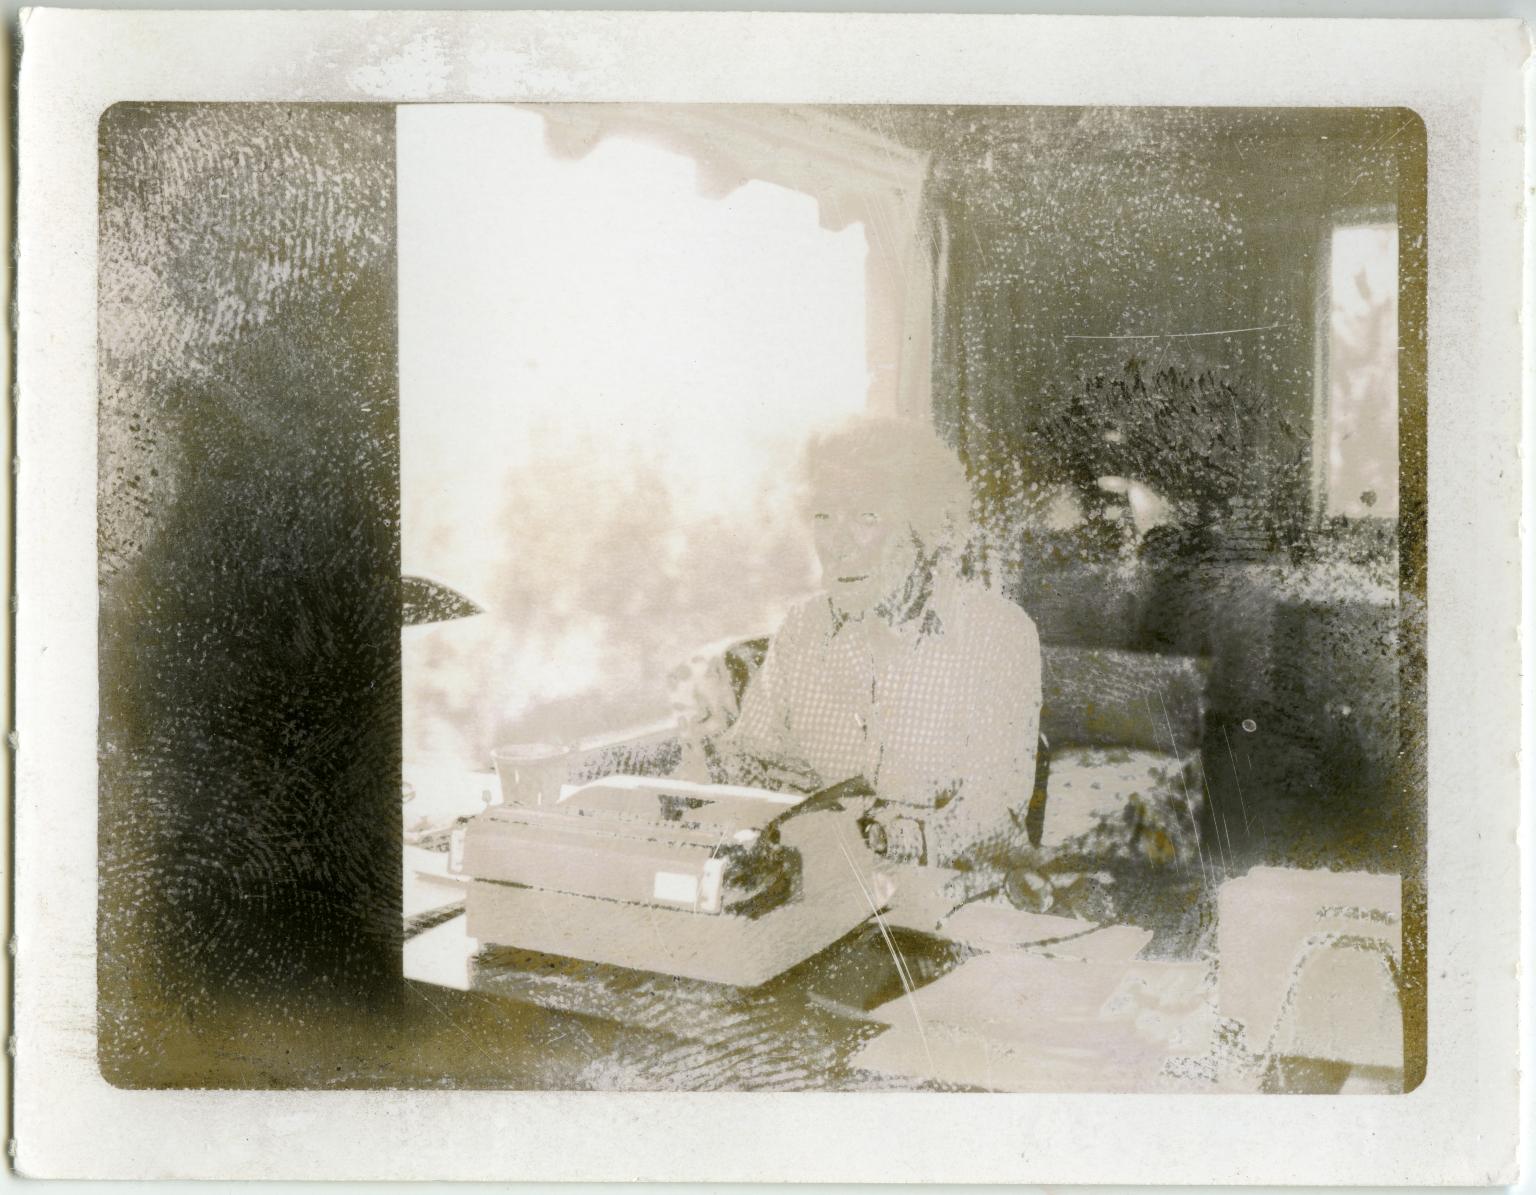 Mary Hemingway at Desk in Ketchum